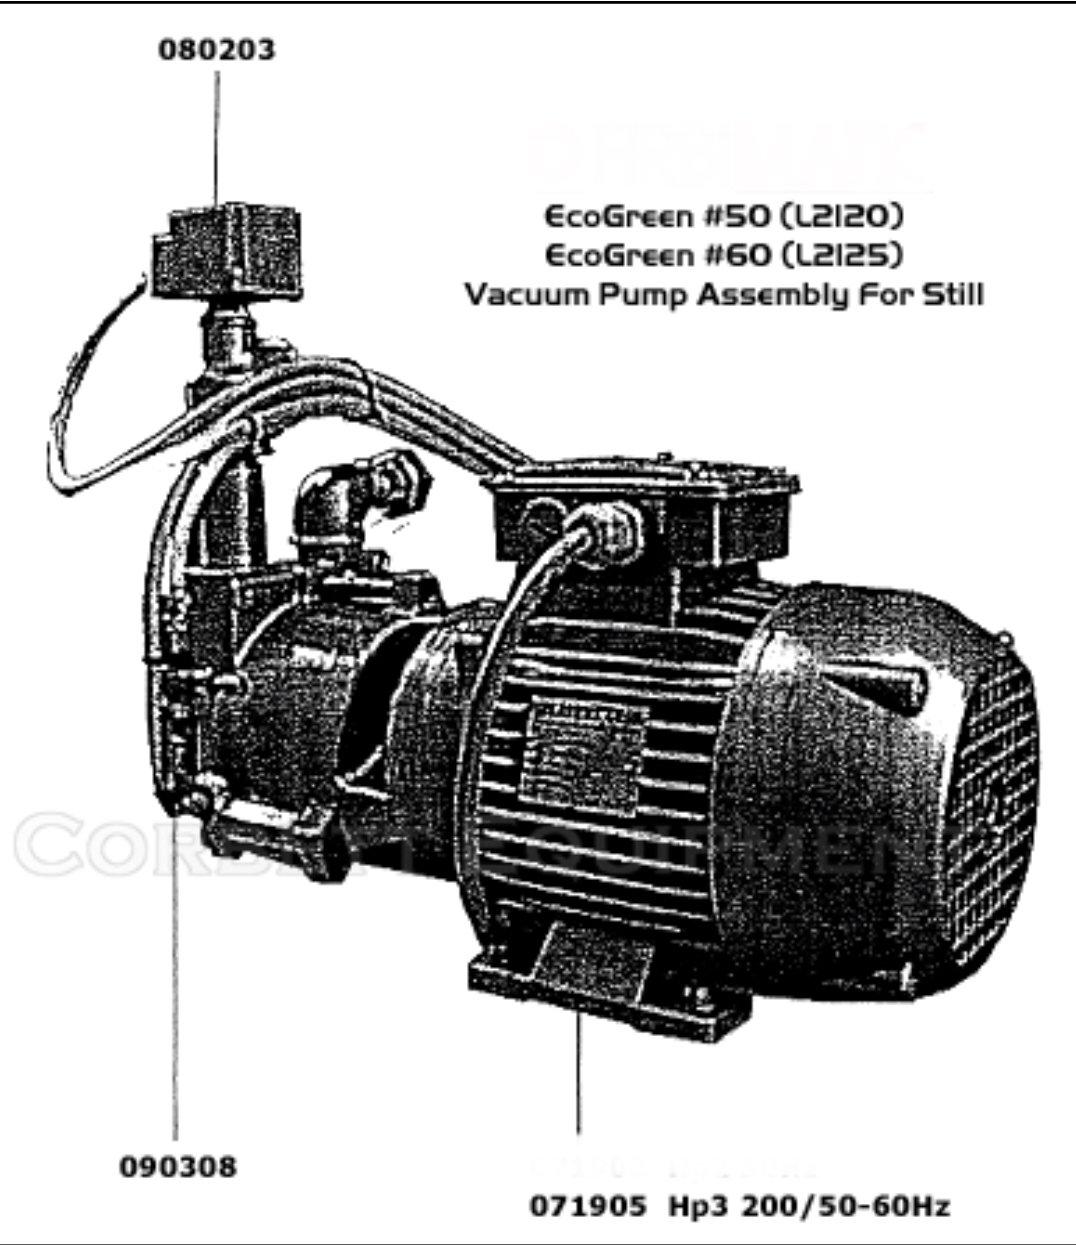 TRMB 32-50 Vacuum Pump 3 HP Liquid Cooled # M17726 & 0719005 0719053 TRMB 32-50 FOR FIRBIMATIC, UNION, REALSTAR